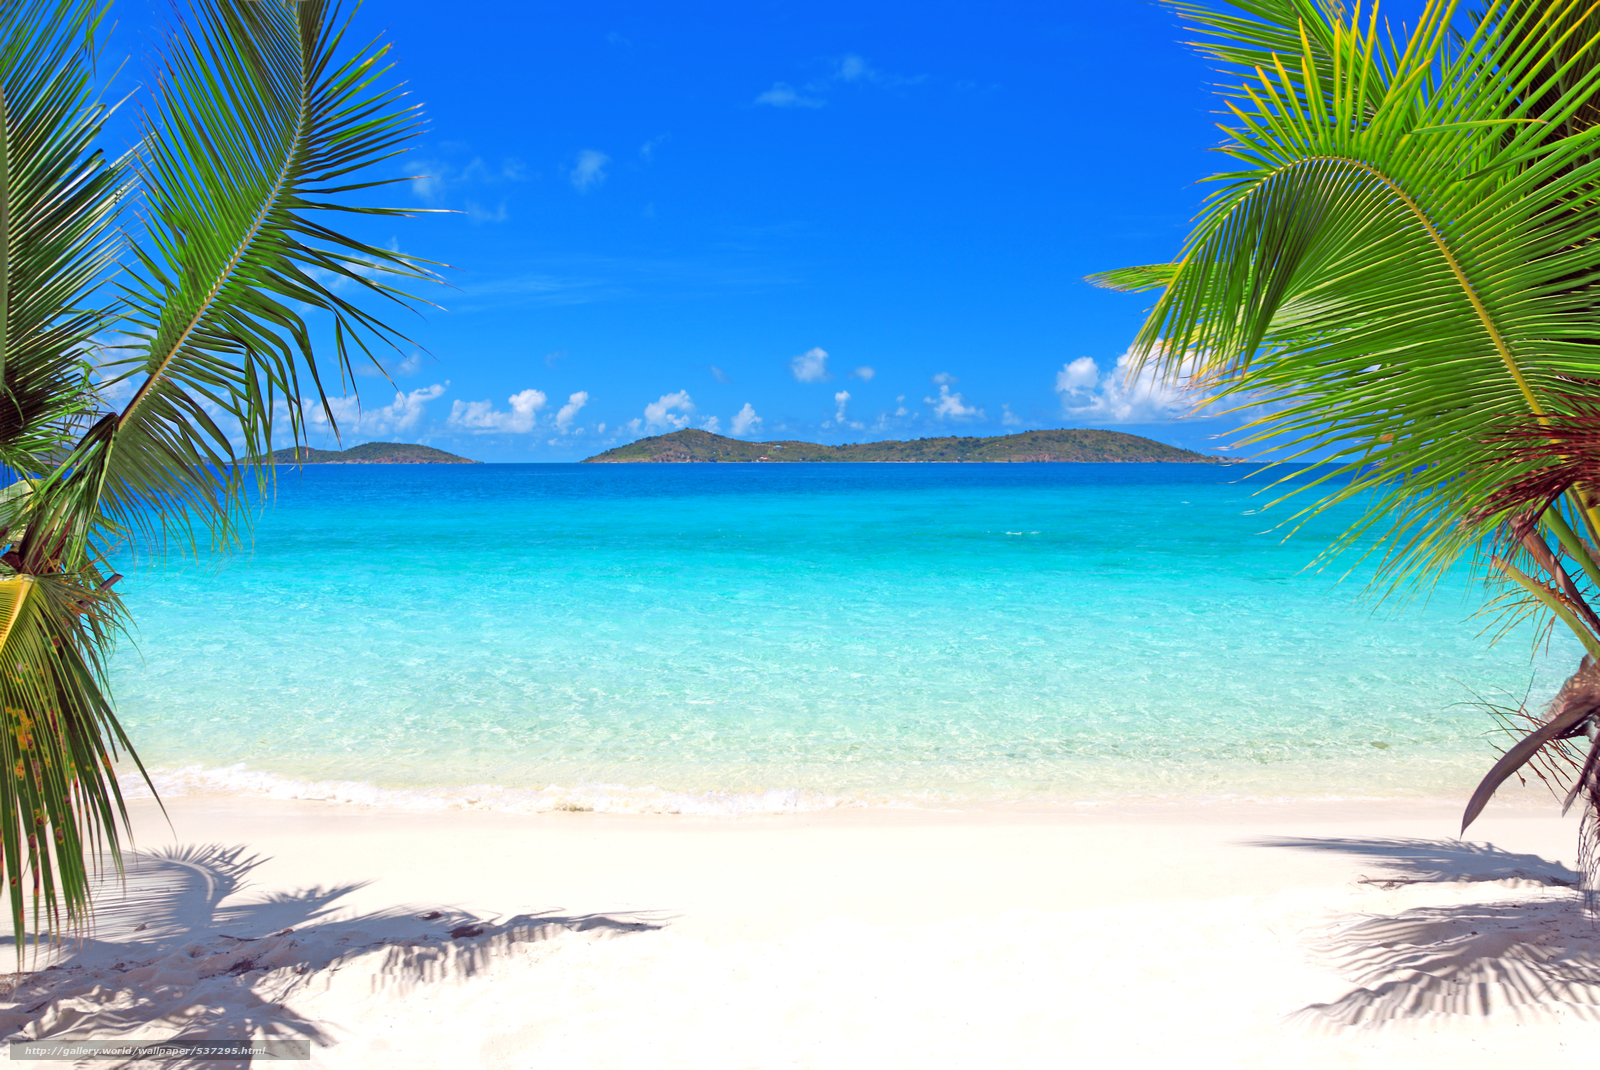 Tlcharger fond d 39 ecran paysage plage mer fonds d 39 ecran for Foto fond ecran